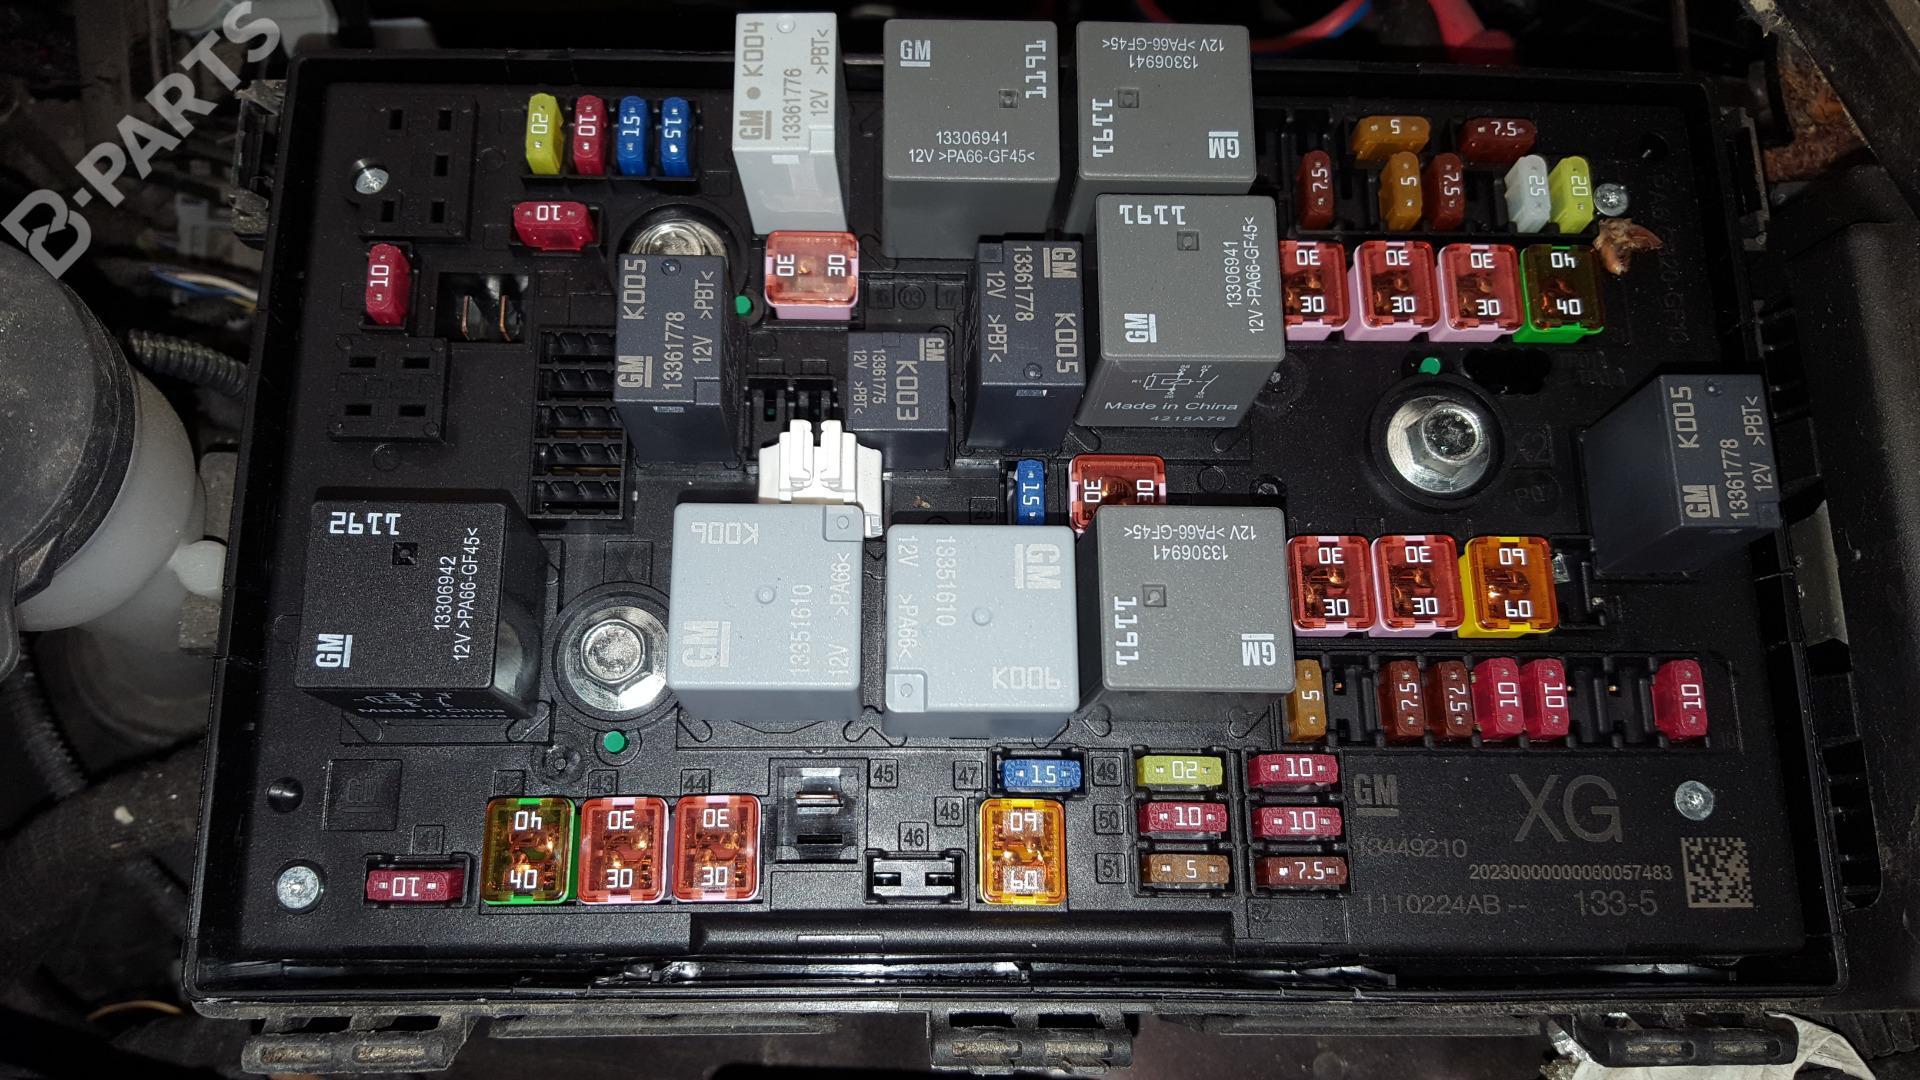 Opel Astra J Fuse Box Wiring Library Ts Location 13449210 1110224ab1335 P10 16 Cdti 68